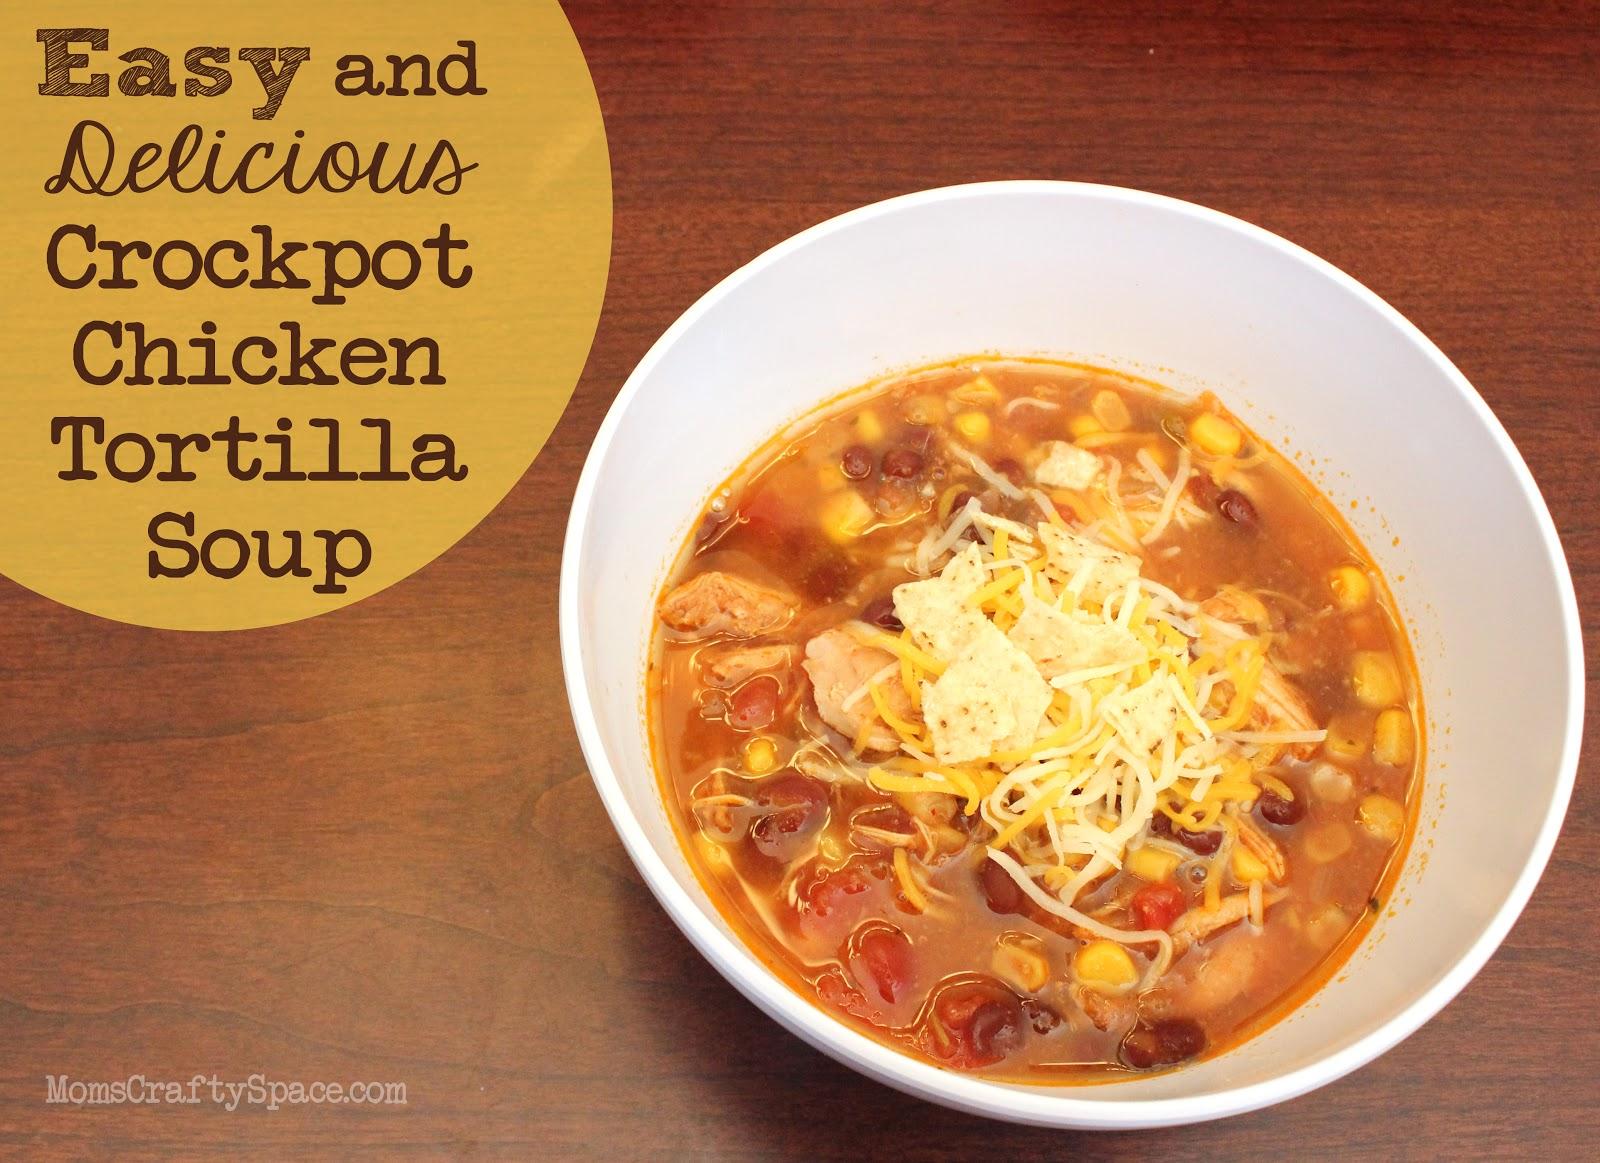 Easy and Delicious Crockpot Chicken